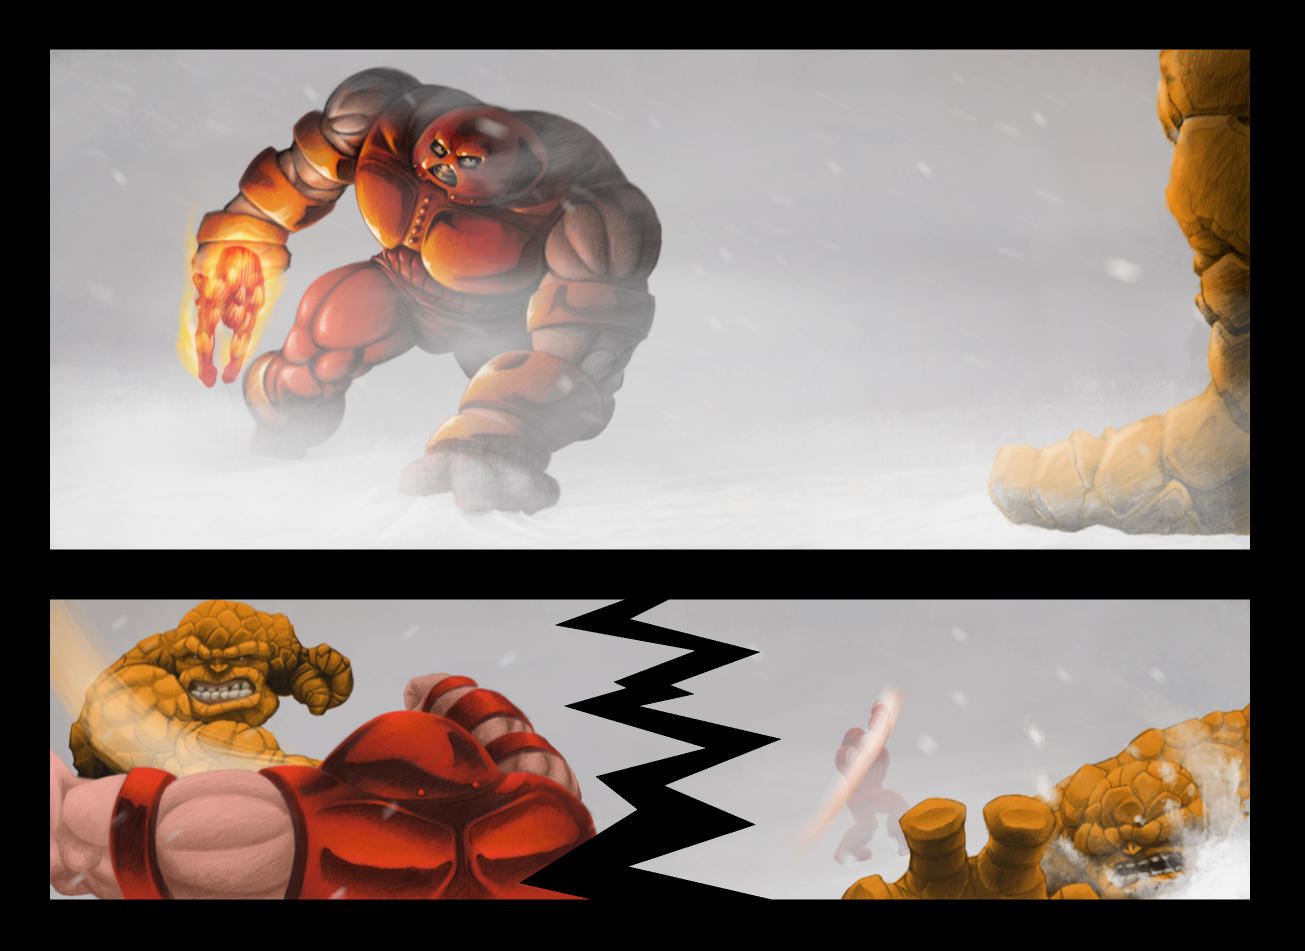 Juggernaut vs. Thing Final by brownboot on DeviantArt